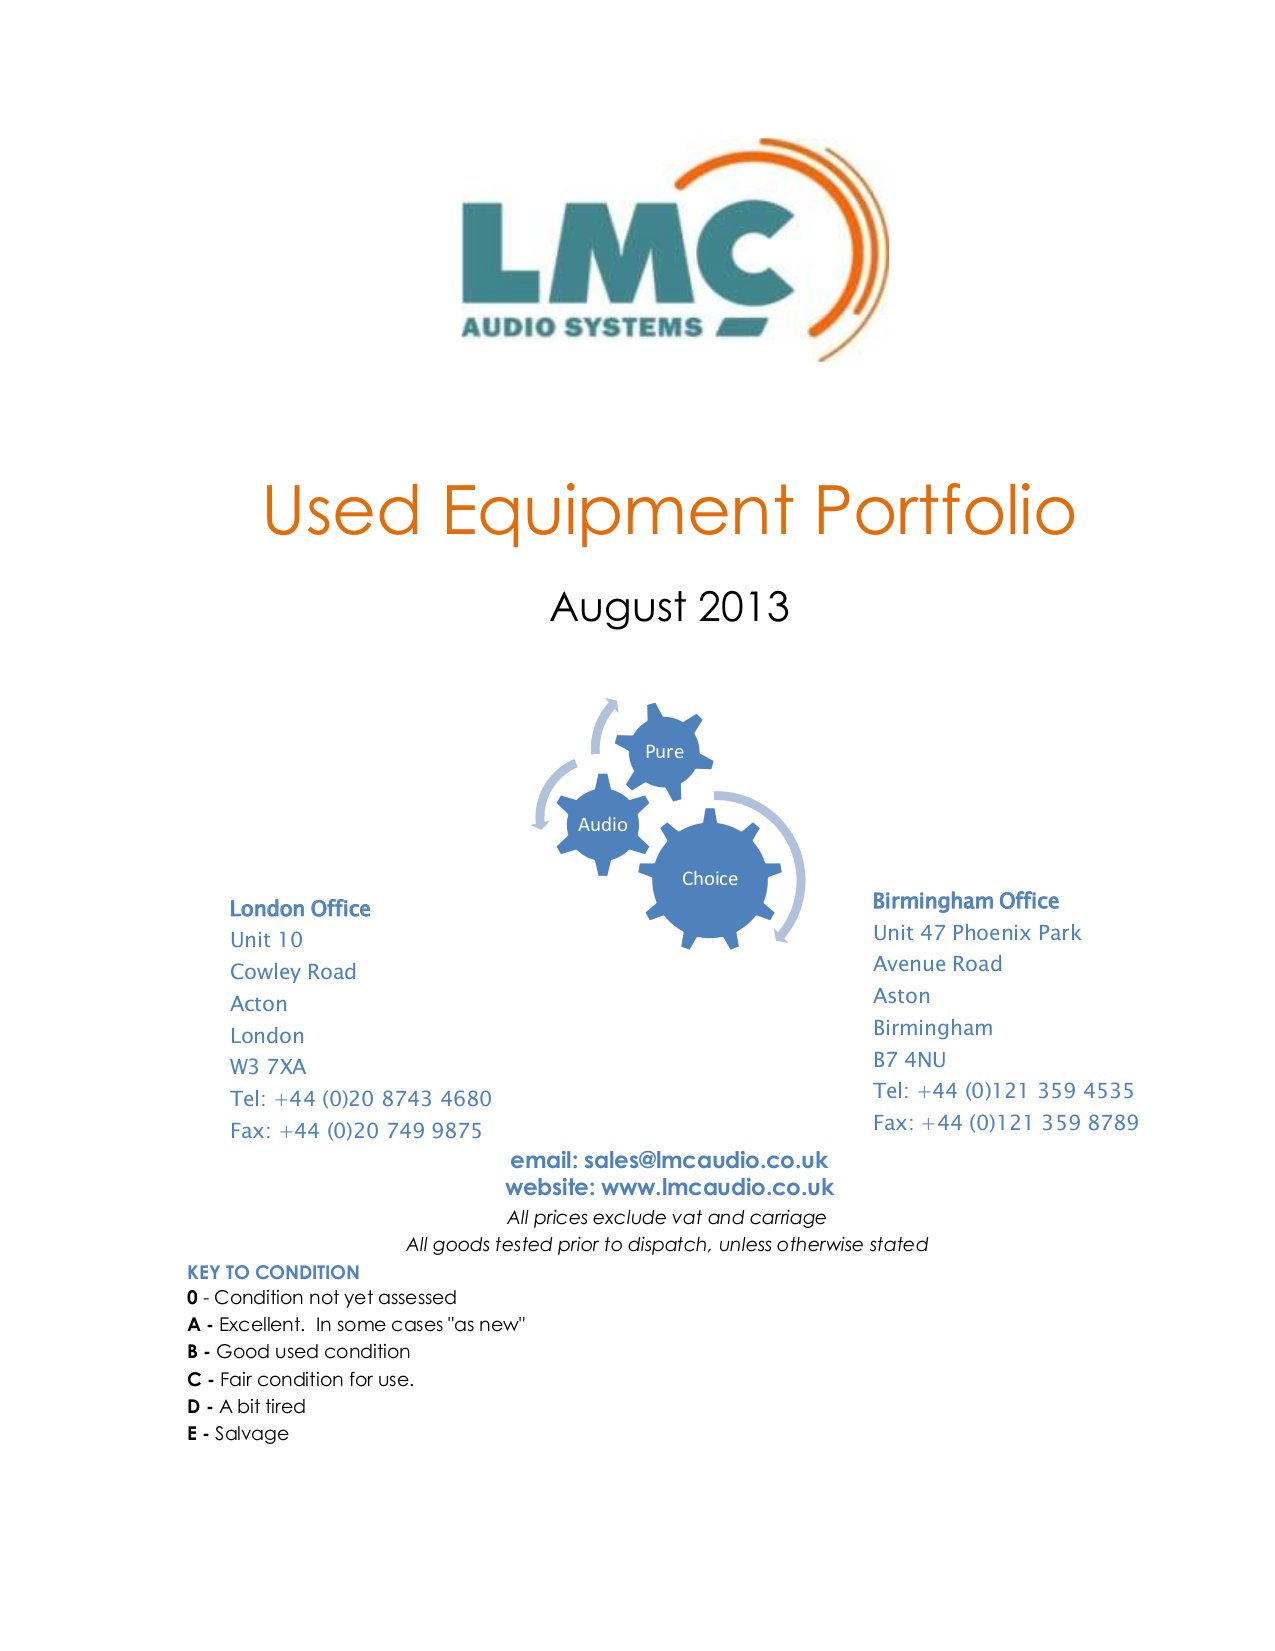 izotope rx 6 manual pdf